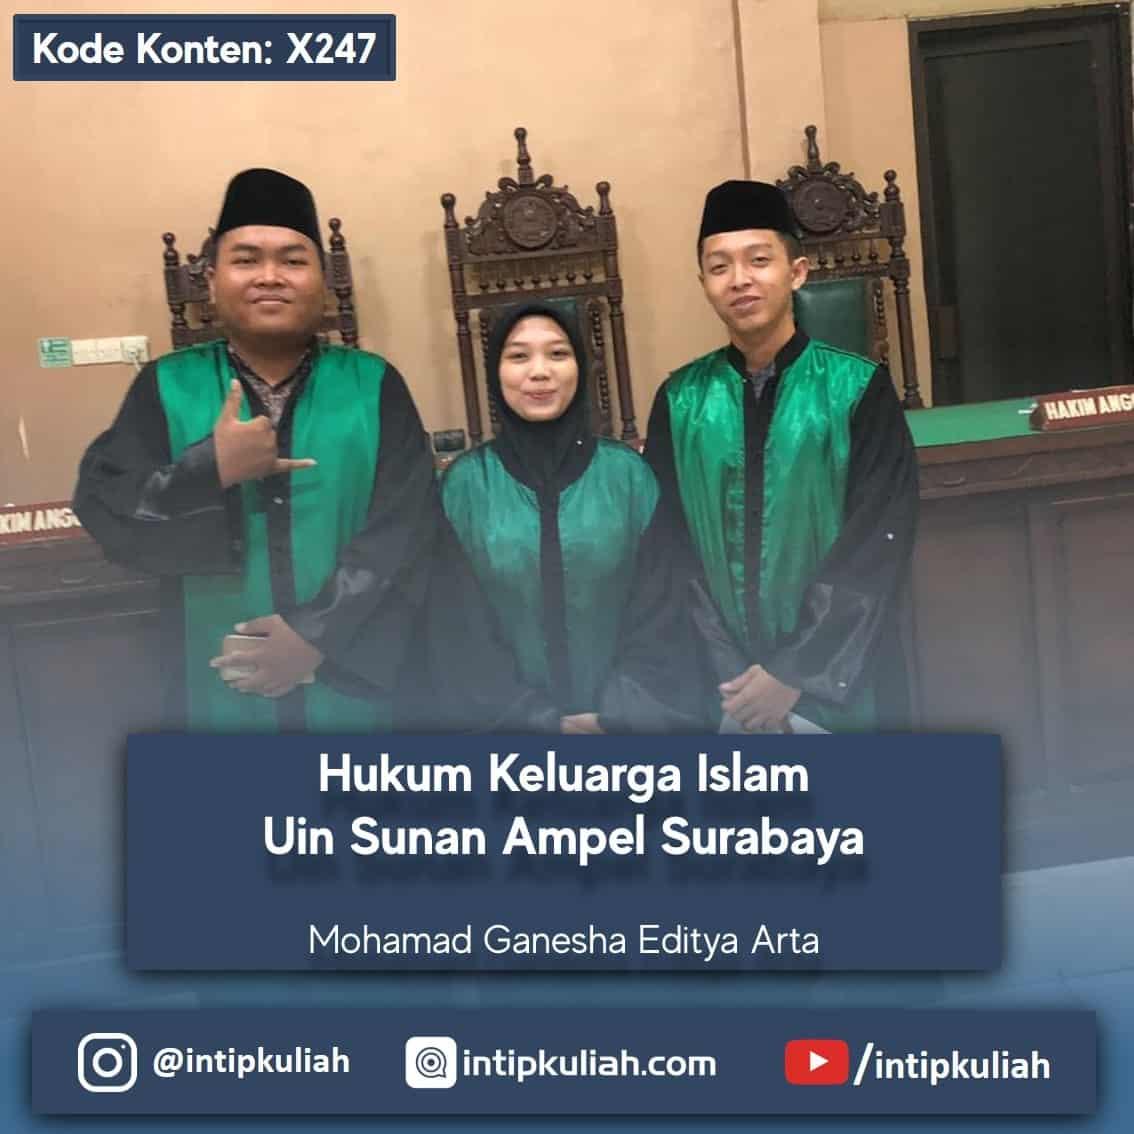 Hukum Keluarga Islam UIN Sunan Ampel Surabaya (Ganesha)